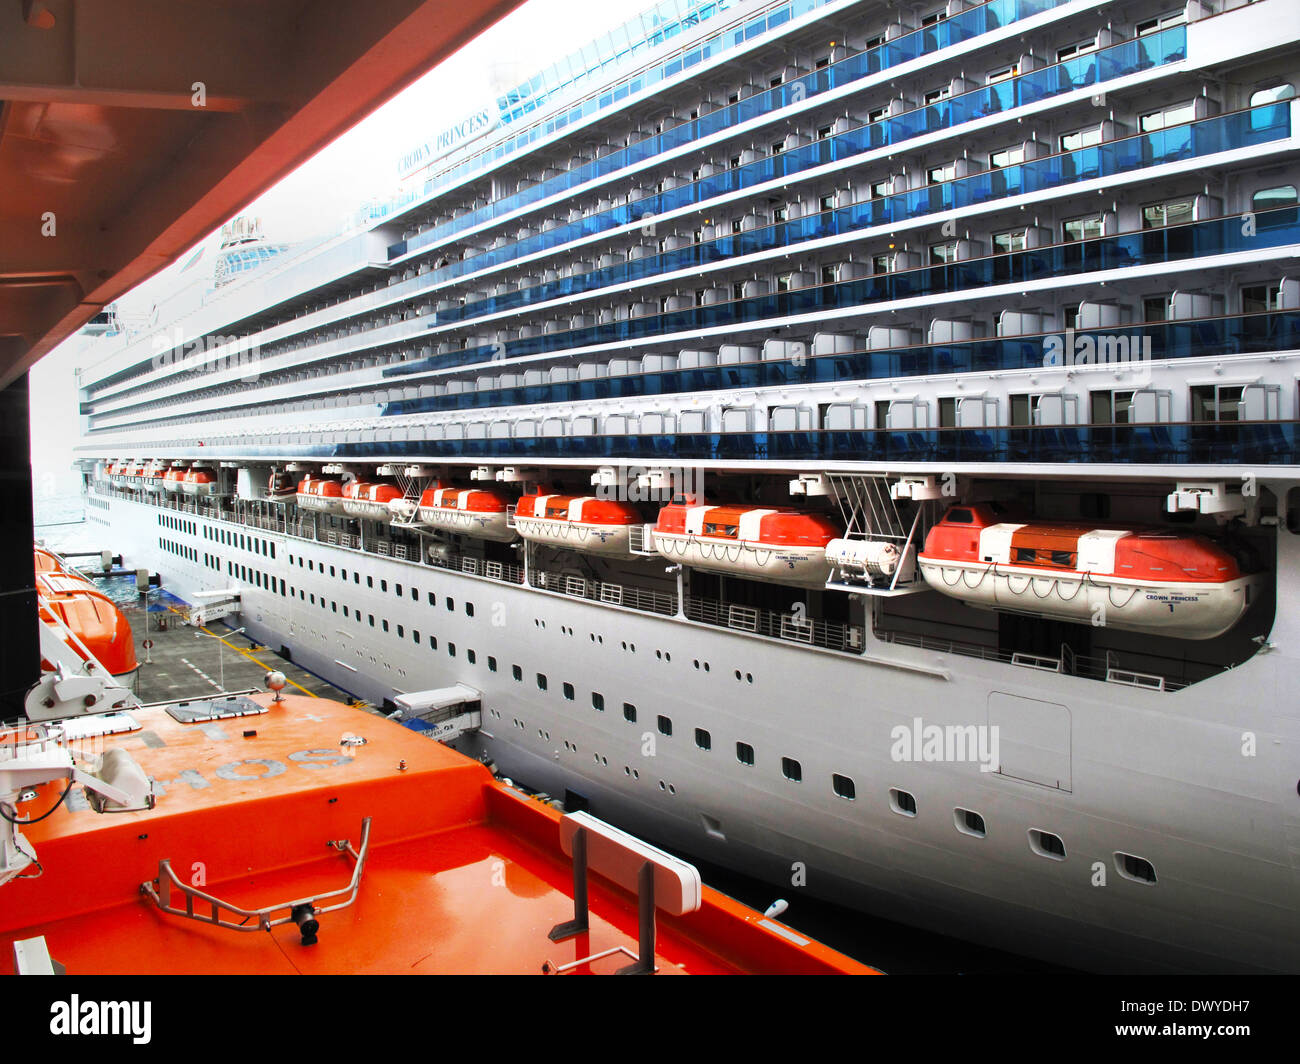 Eurodam Cruise Ship Life Boats Stock Photo Royalty Free Image - Eurodam cruise ship